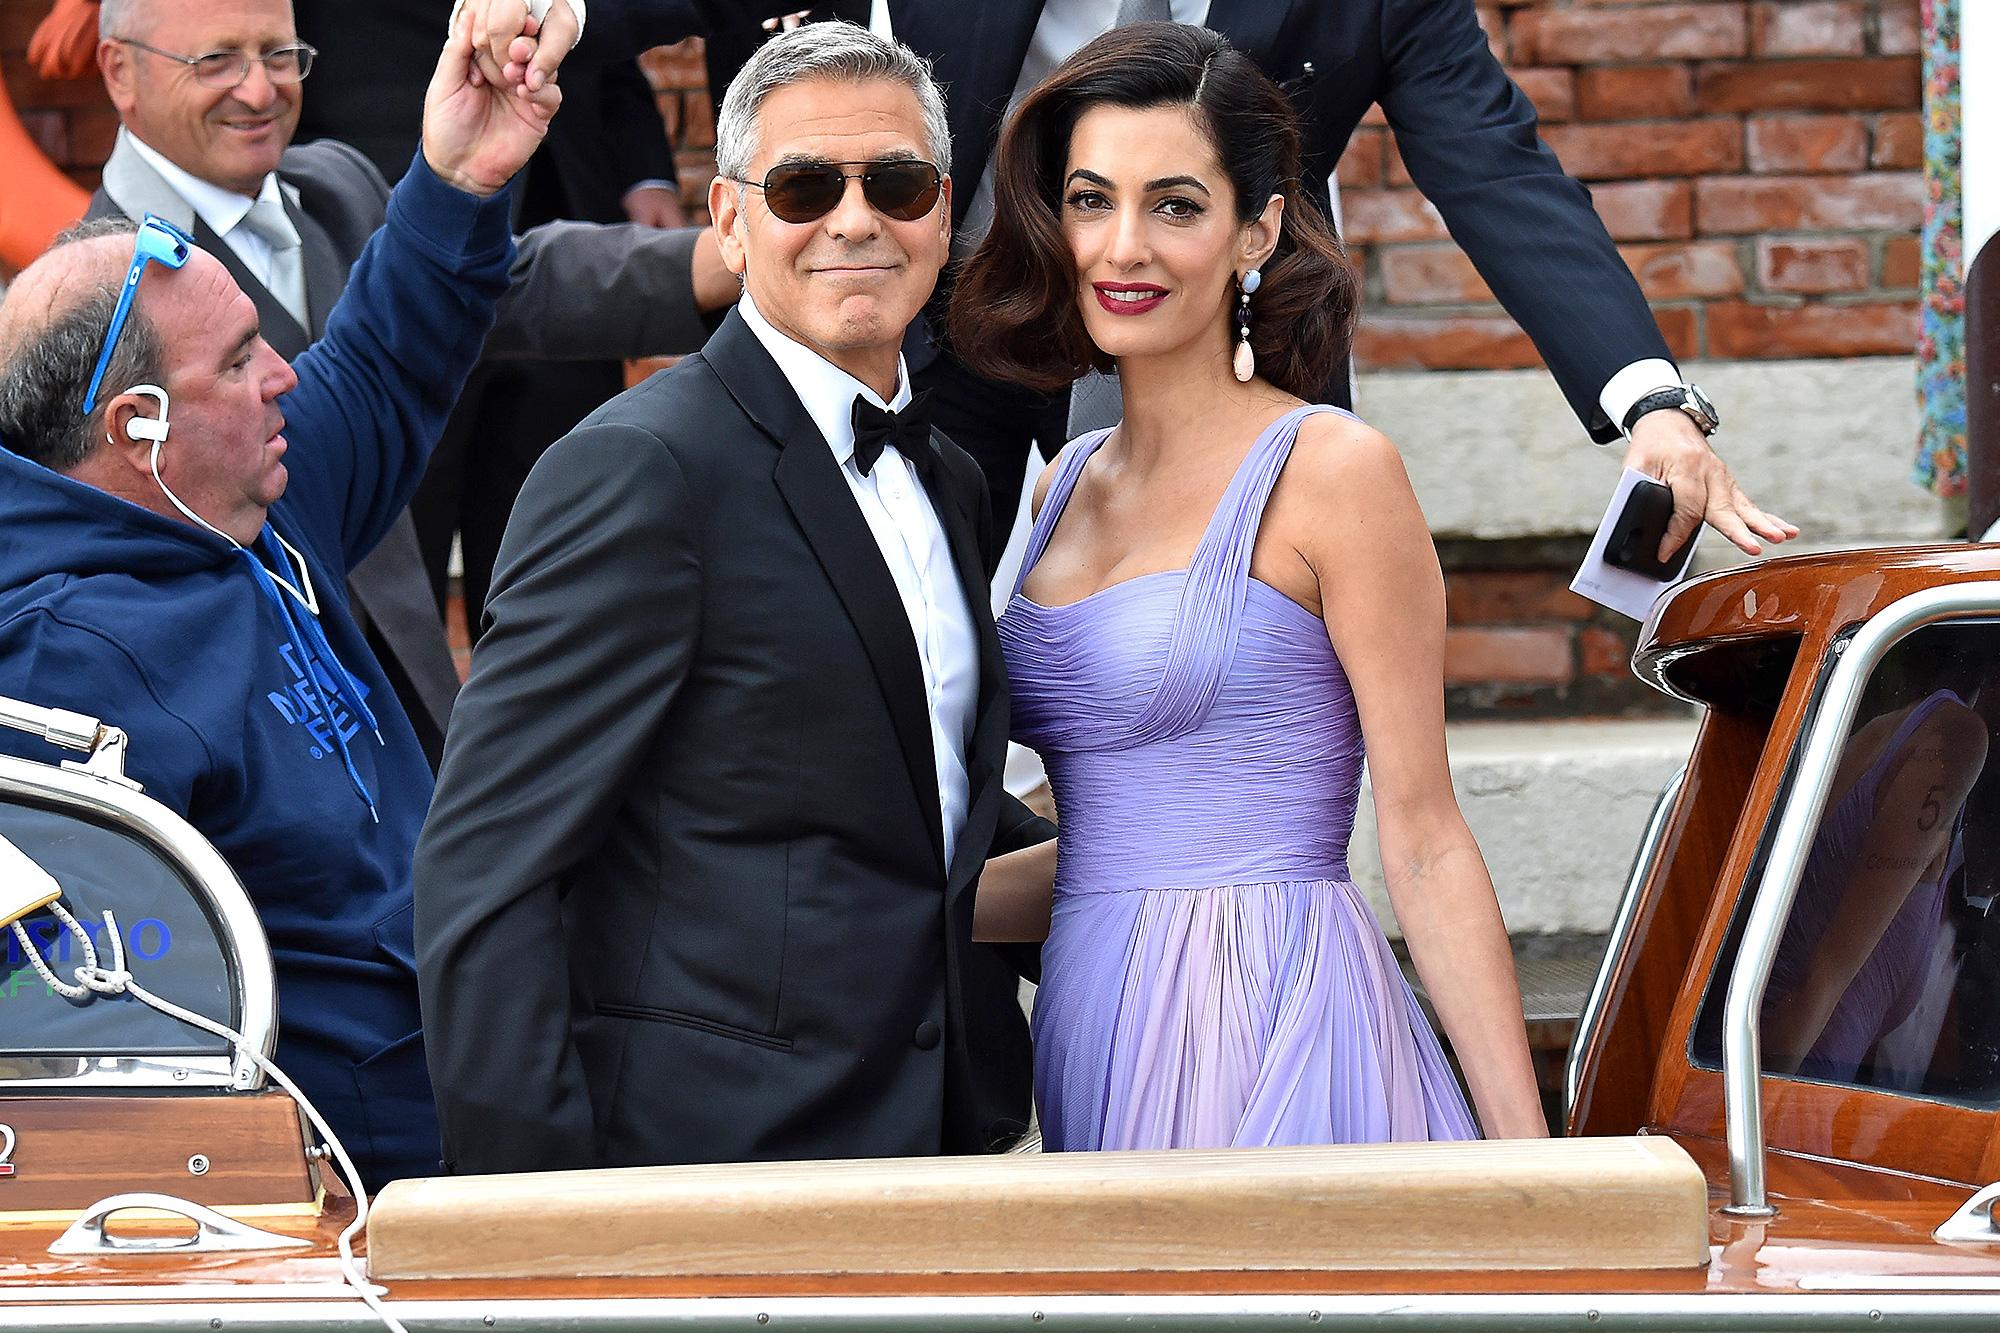 George Clooney, Amal Clooney, Suburbicon, Venice Film Festival Sala Grande, Italy